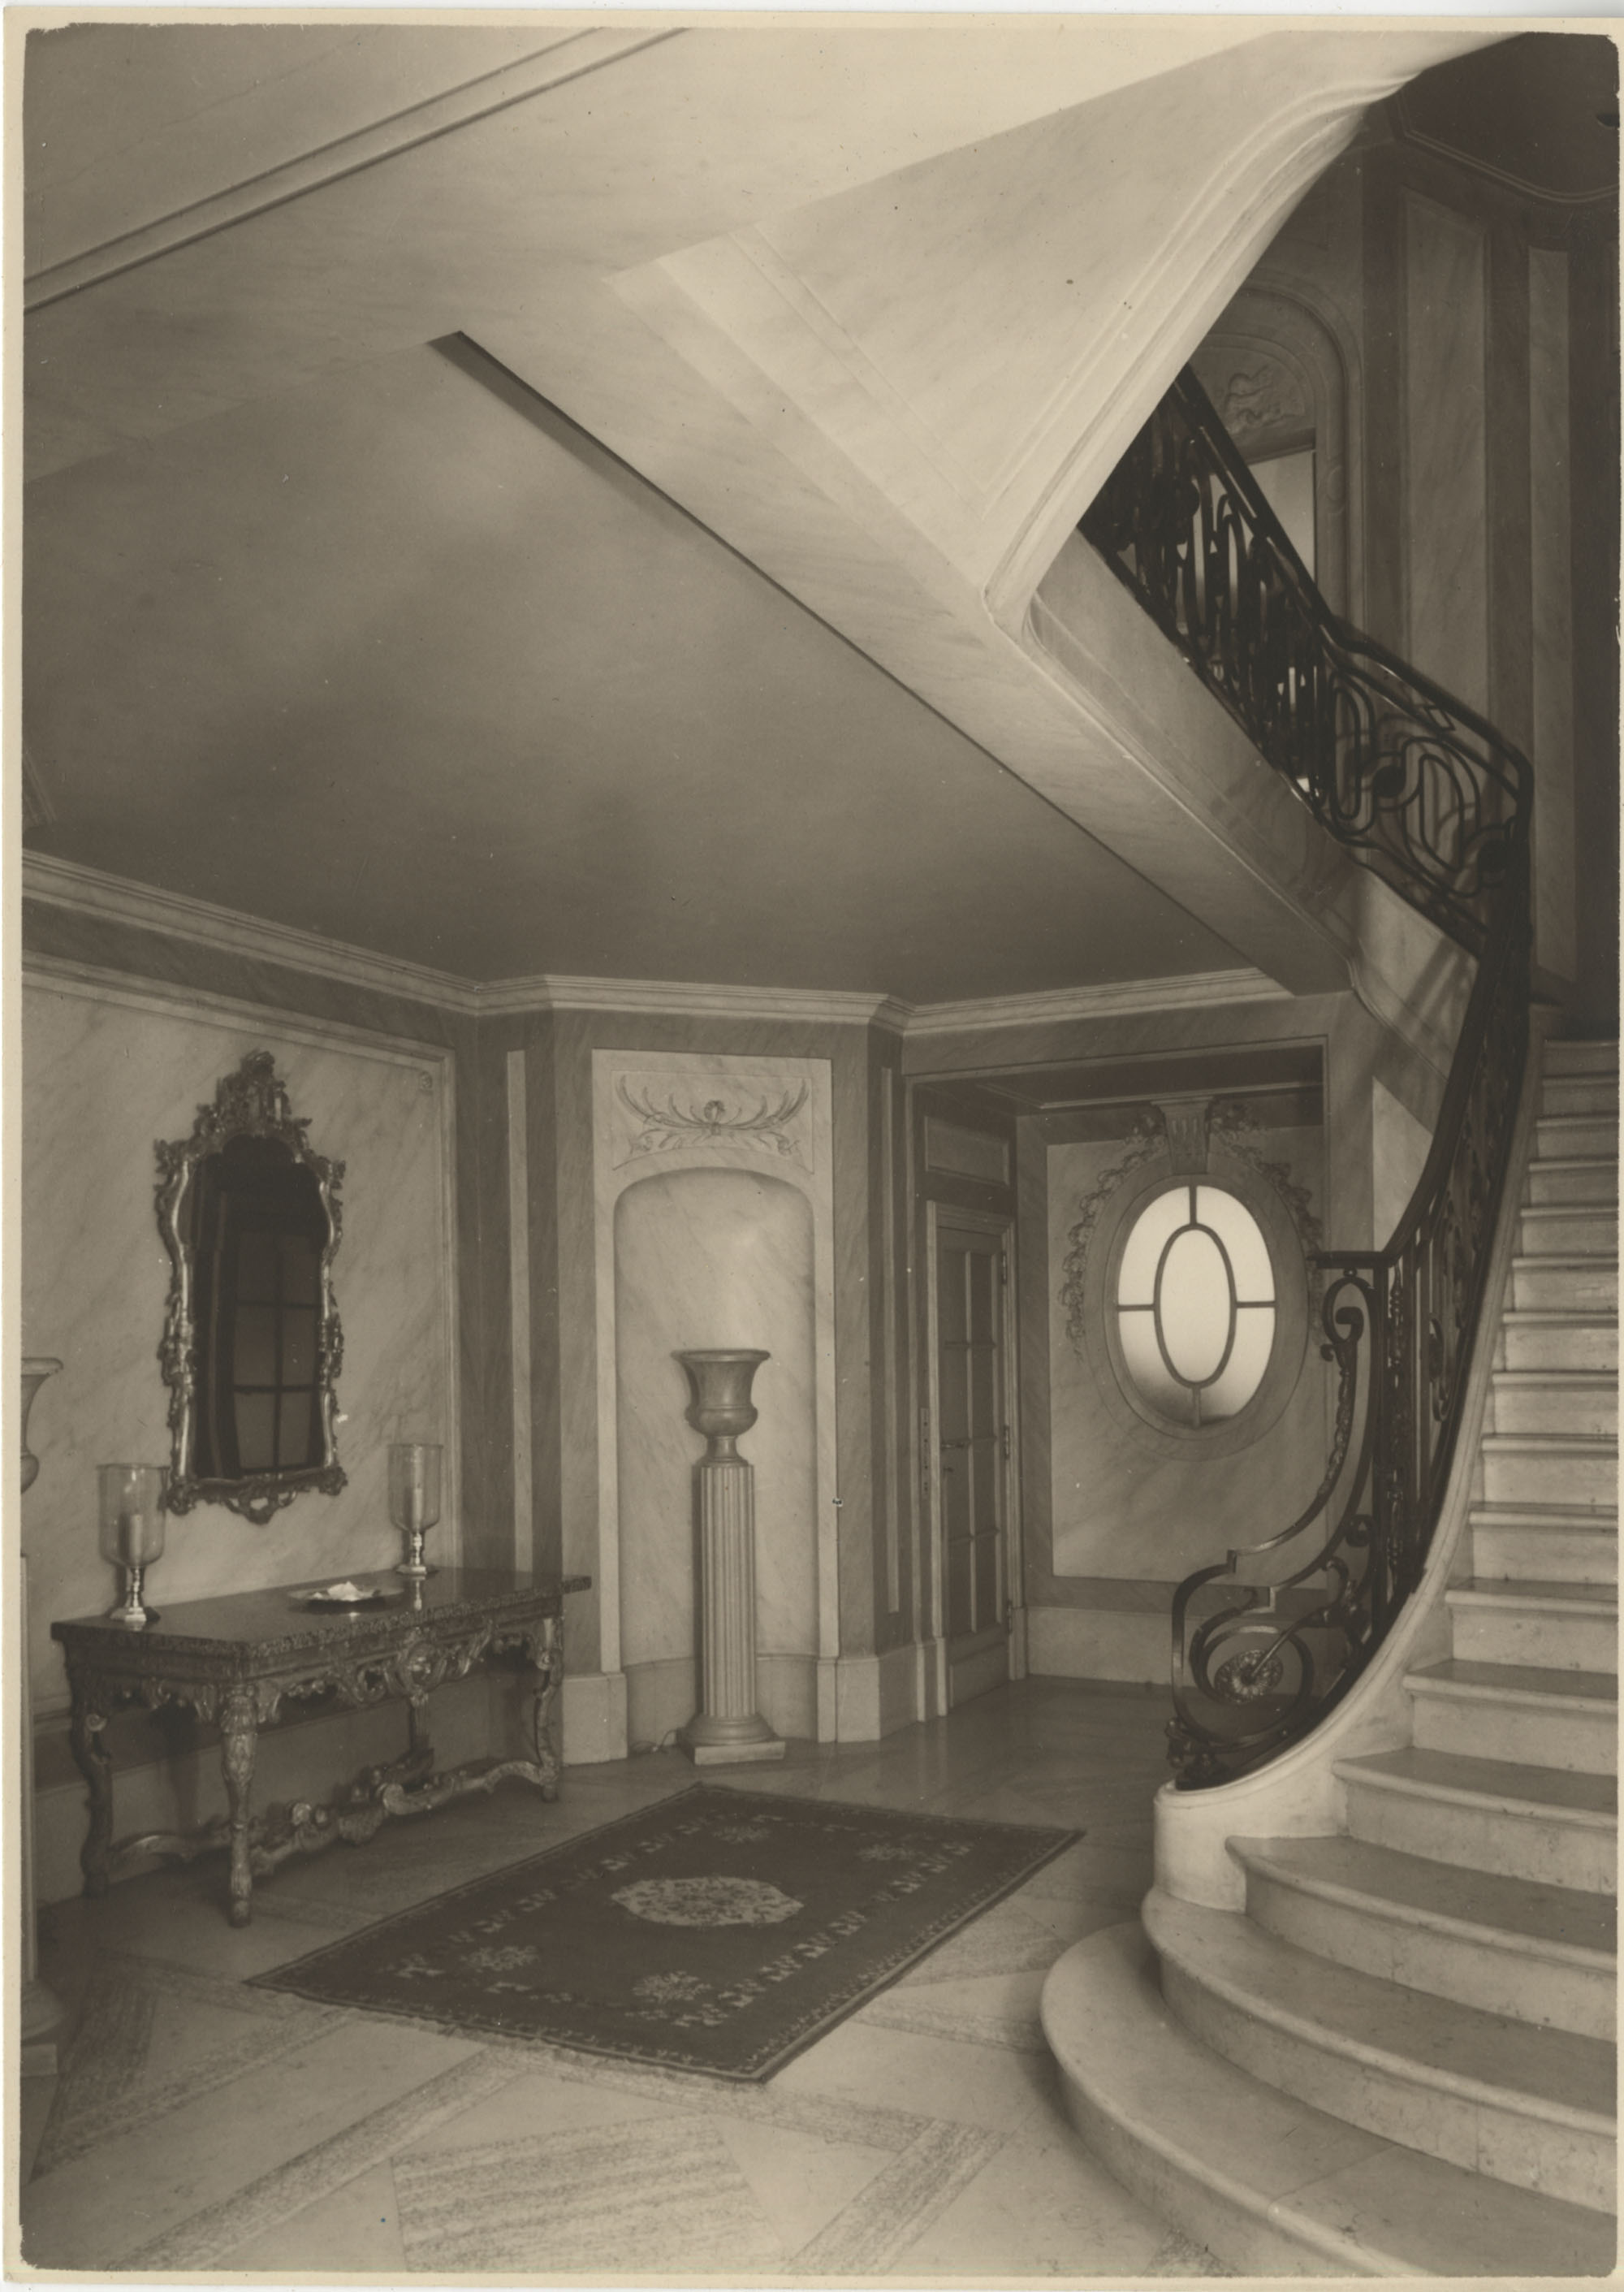 Interior of the Royal Italian Consul in Sri Lanka, Photograph 28